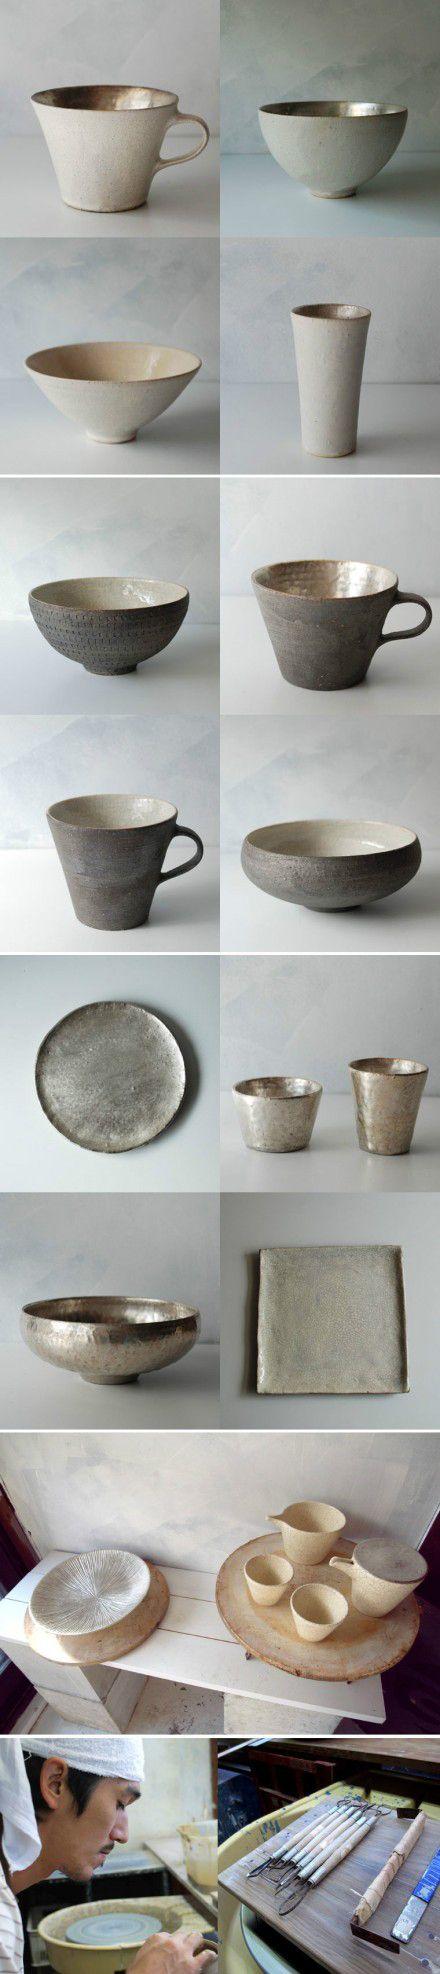 Japanese Ceramics by barefootstyling #Ceramics